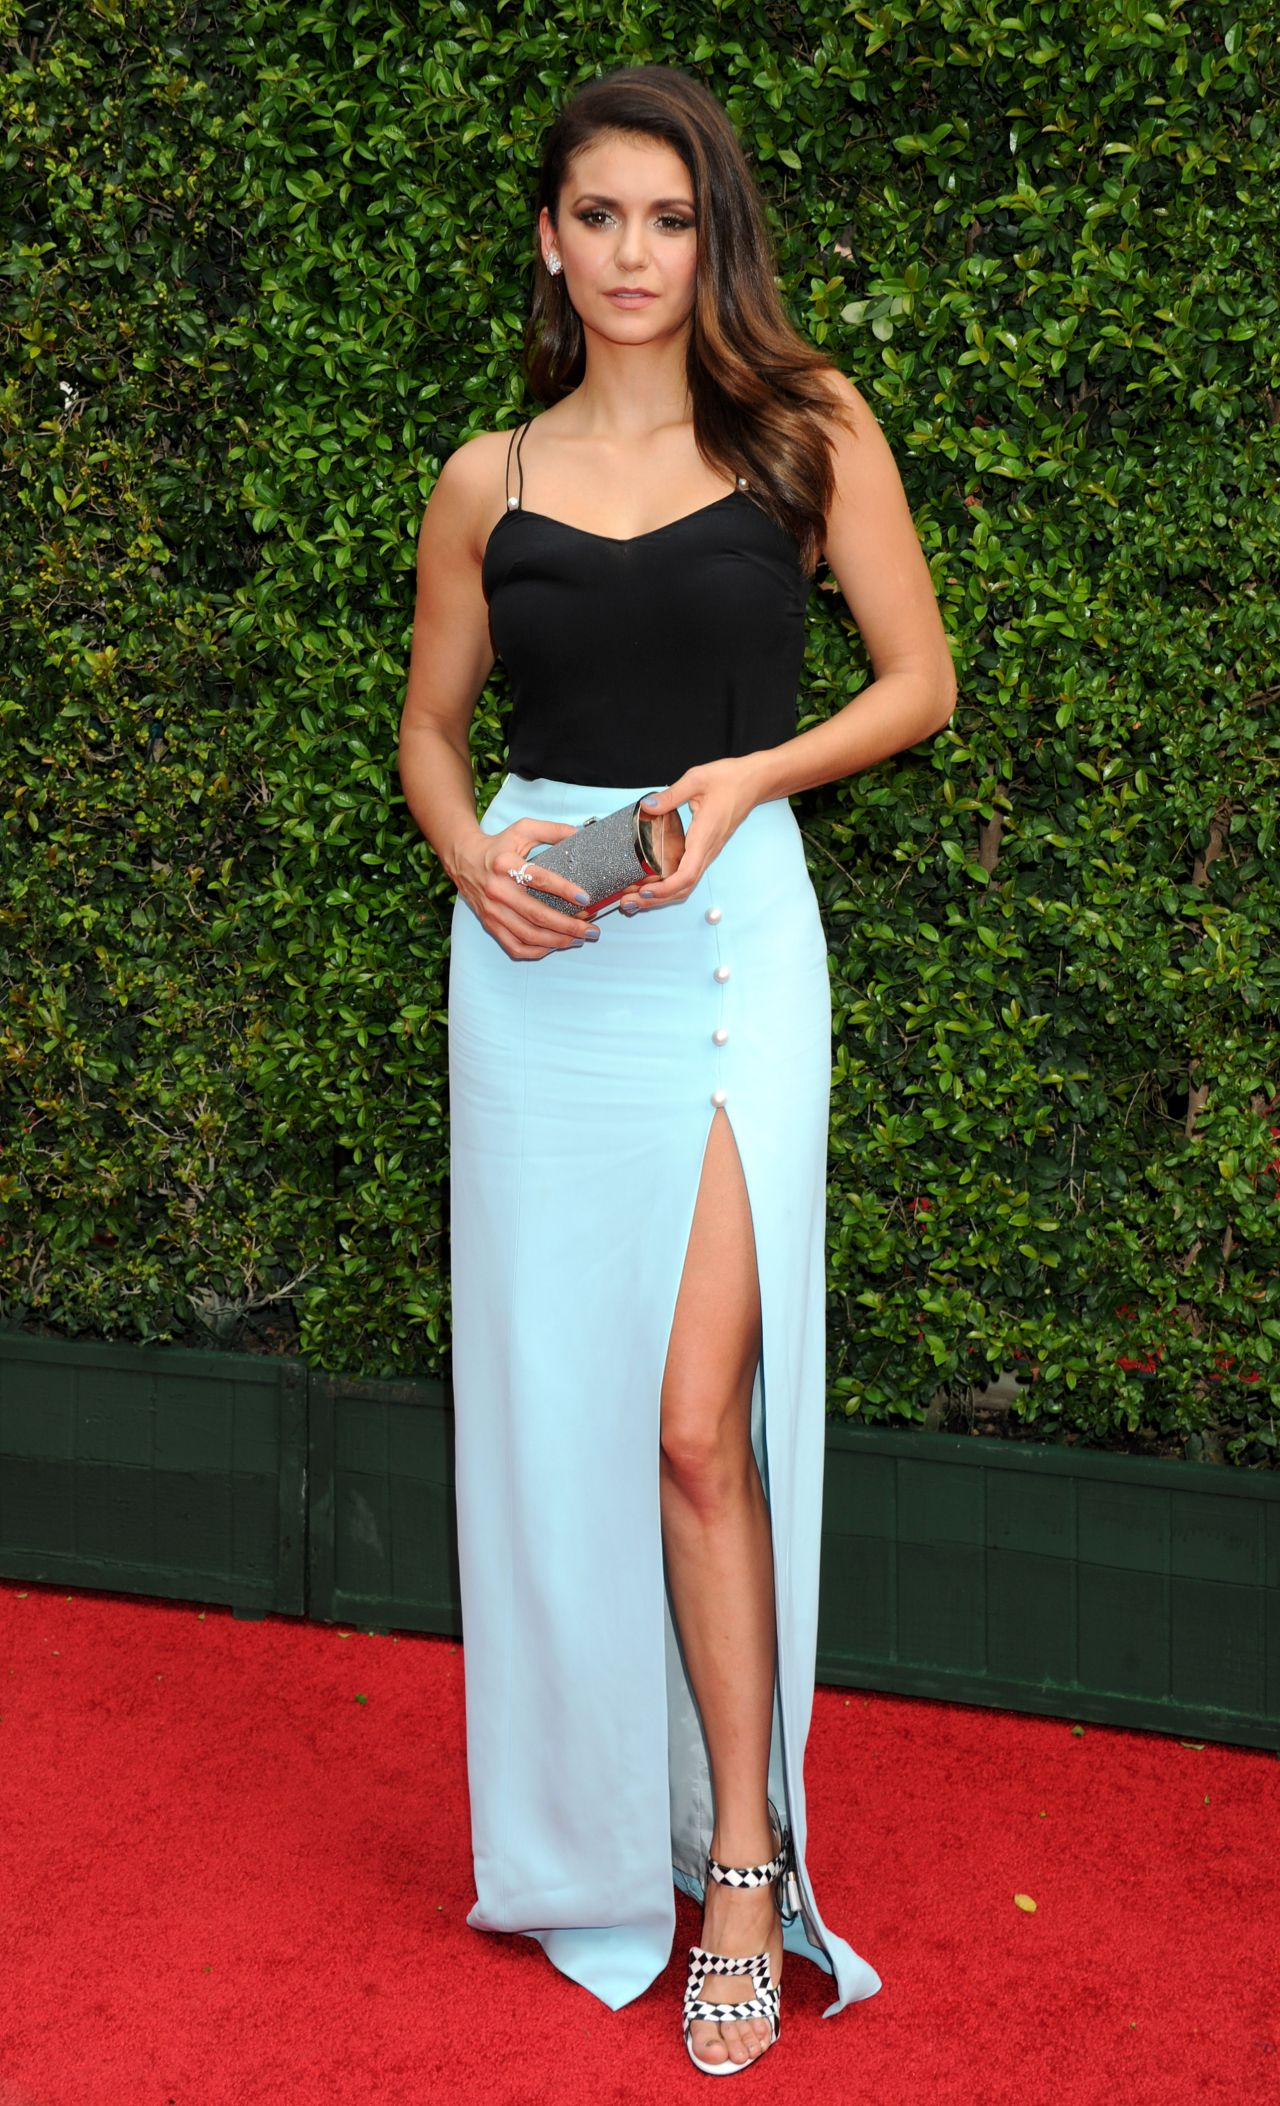 2015 Los Angeles Film Festival: 2015 Creative Arts Emmy Awards In Los Angeles